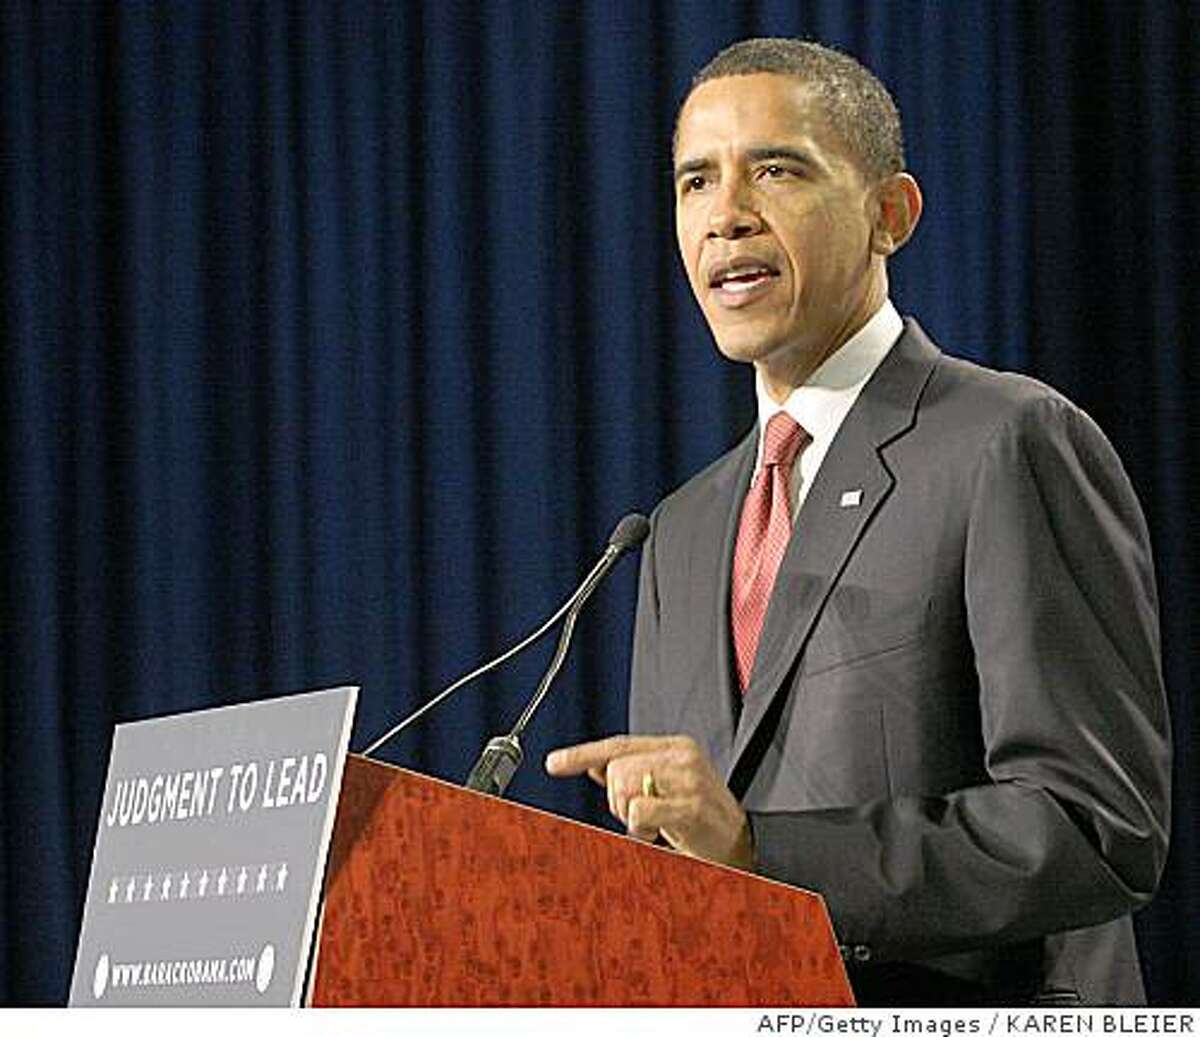 Presumptive Democratic presidential candidate Illinois Sen. Barack Obama delivers remarks on July 15, 2008 at the Ronald Reagan Building in Washington, DC. White House hopeful Barack Obama Tuesday promised to shift the